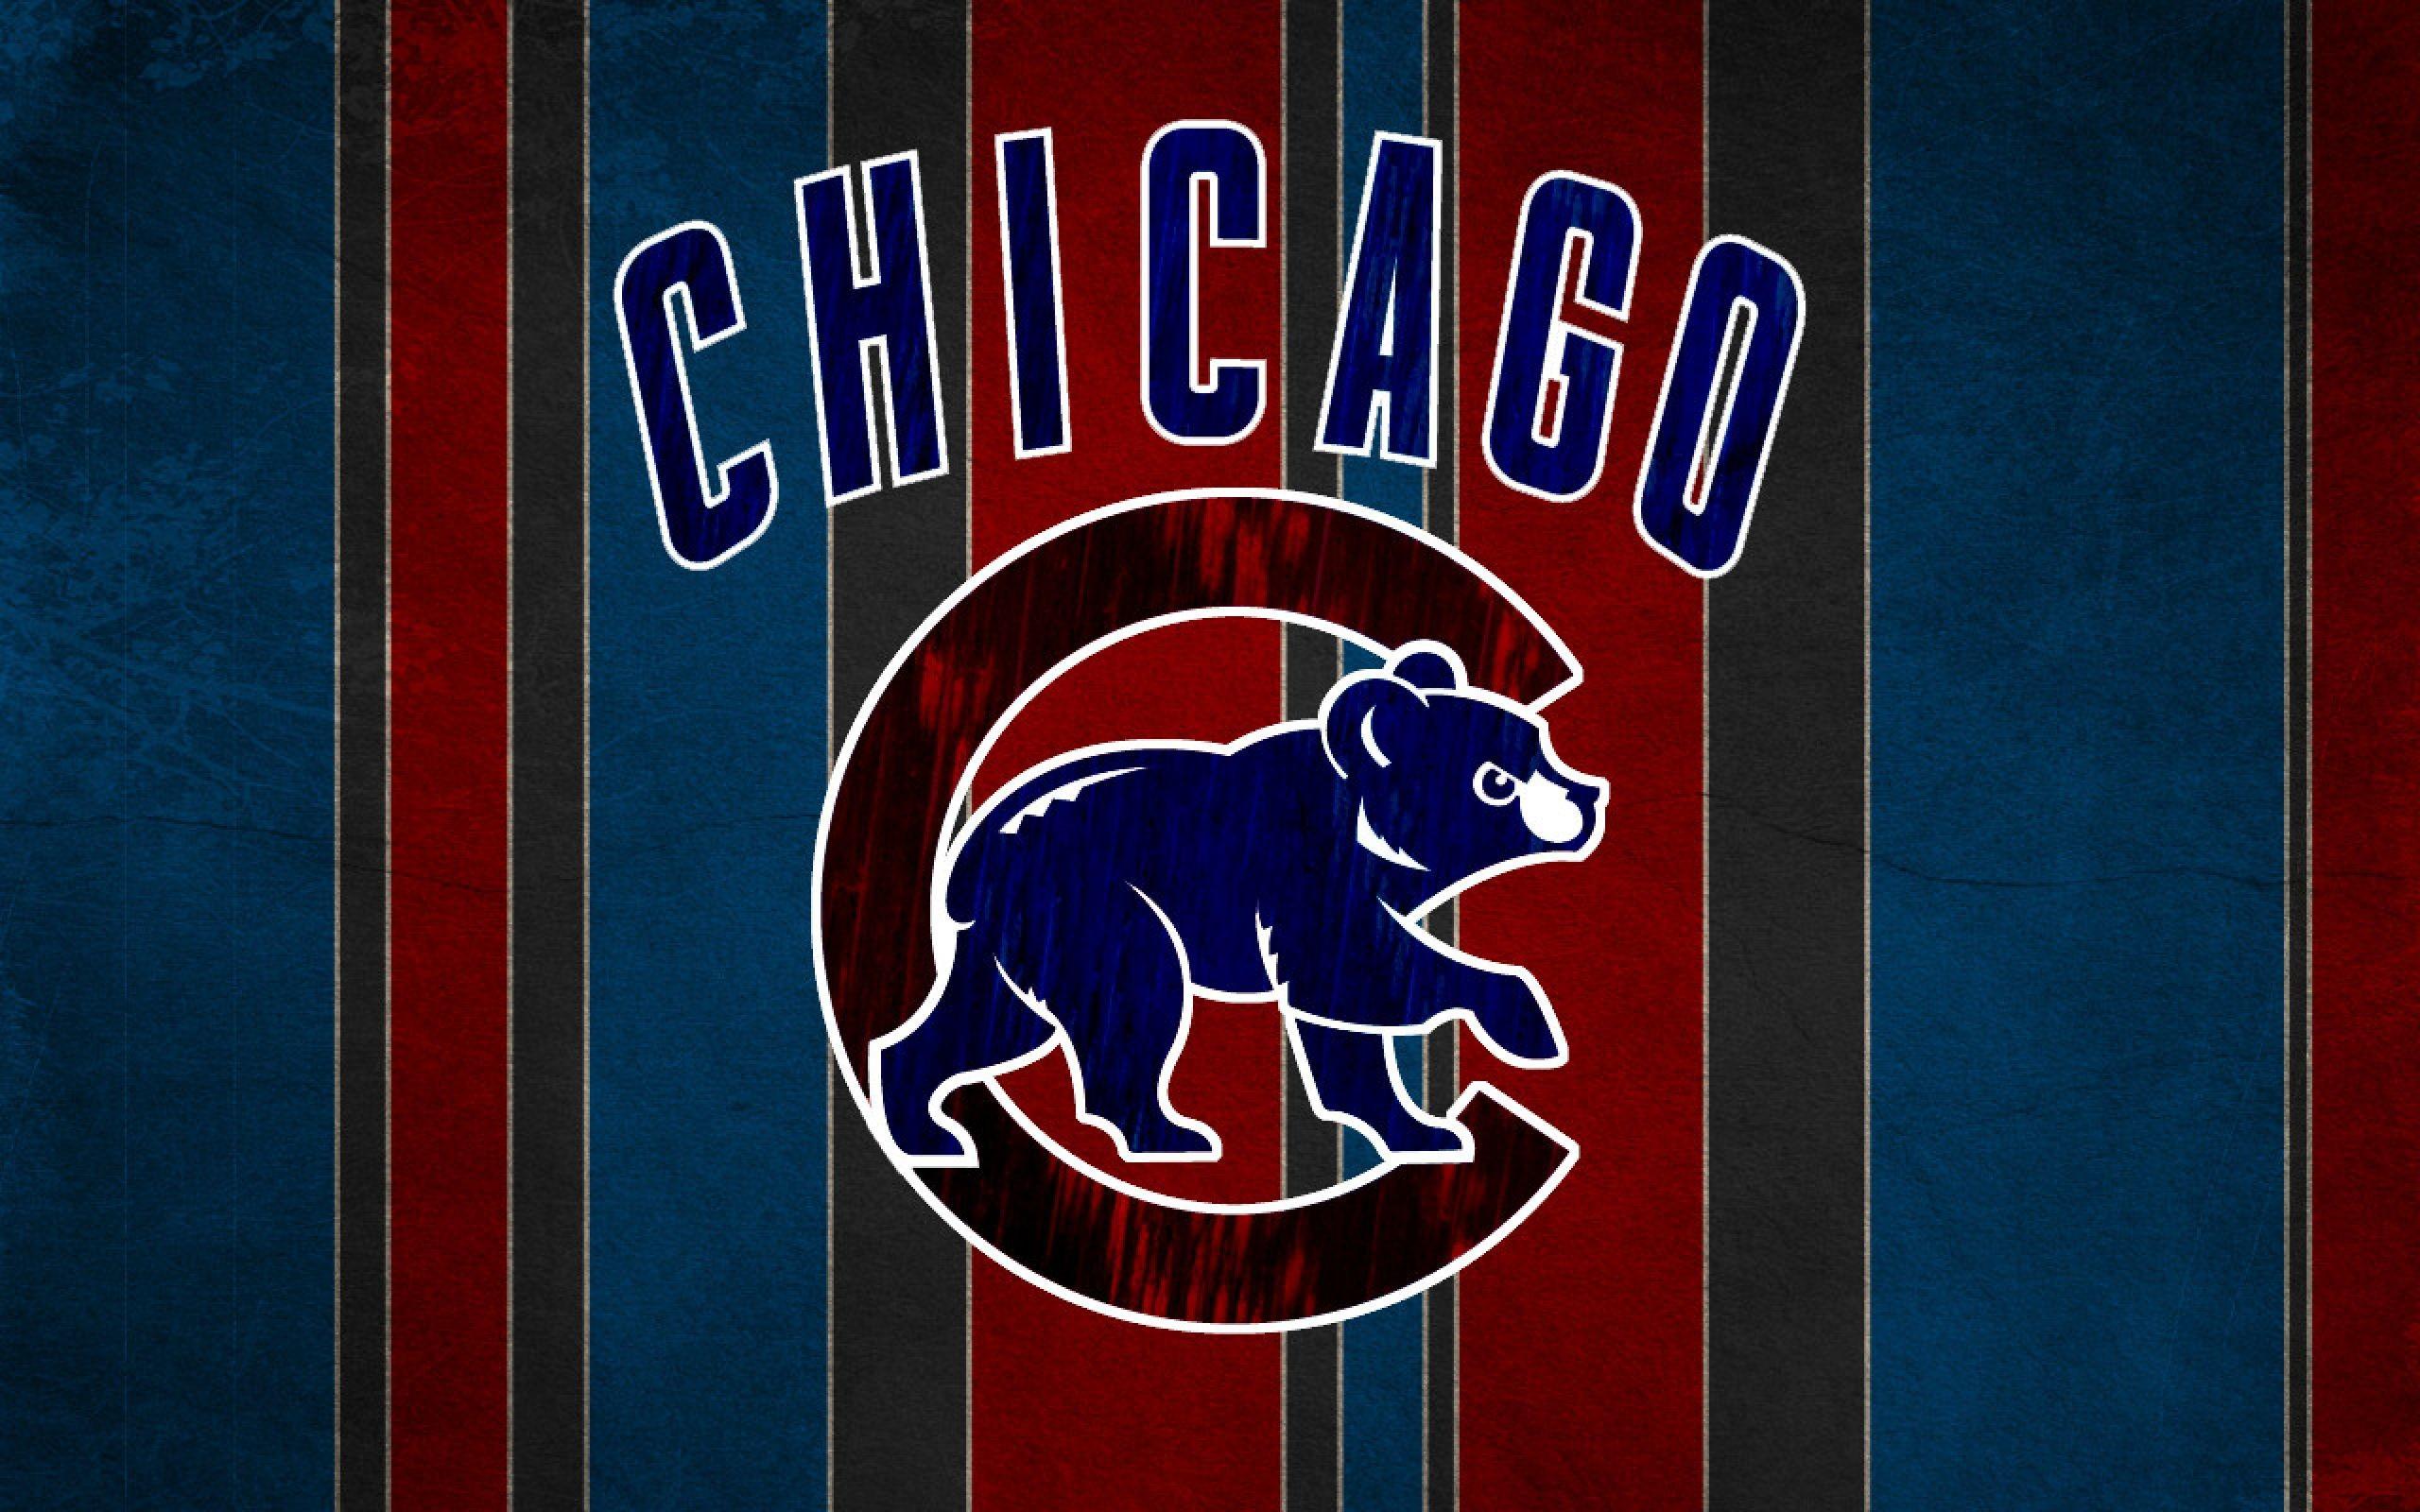 CHICAGO CUBS mlb baseball (58) wallpaper     232586 .